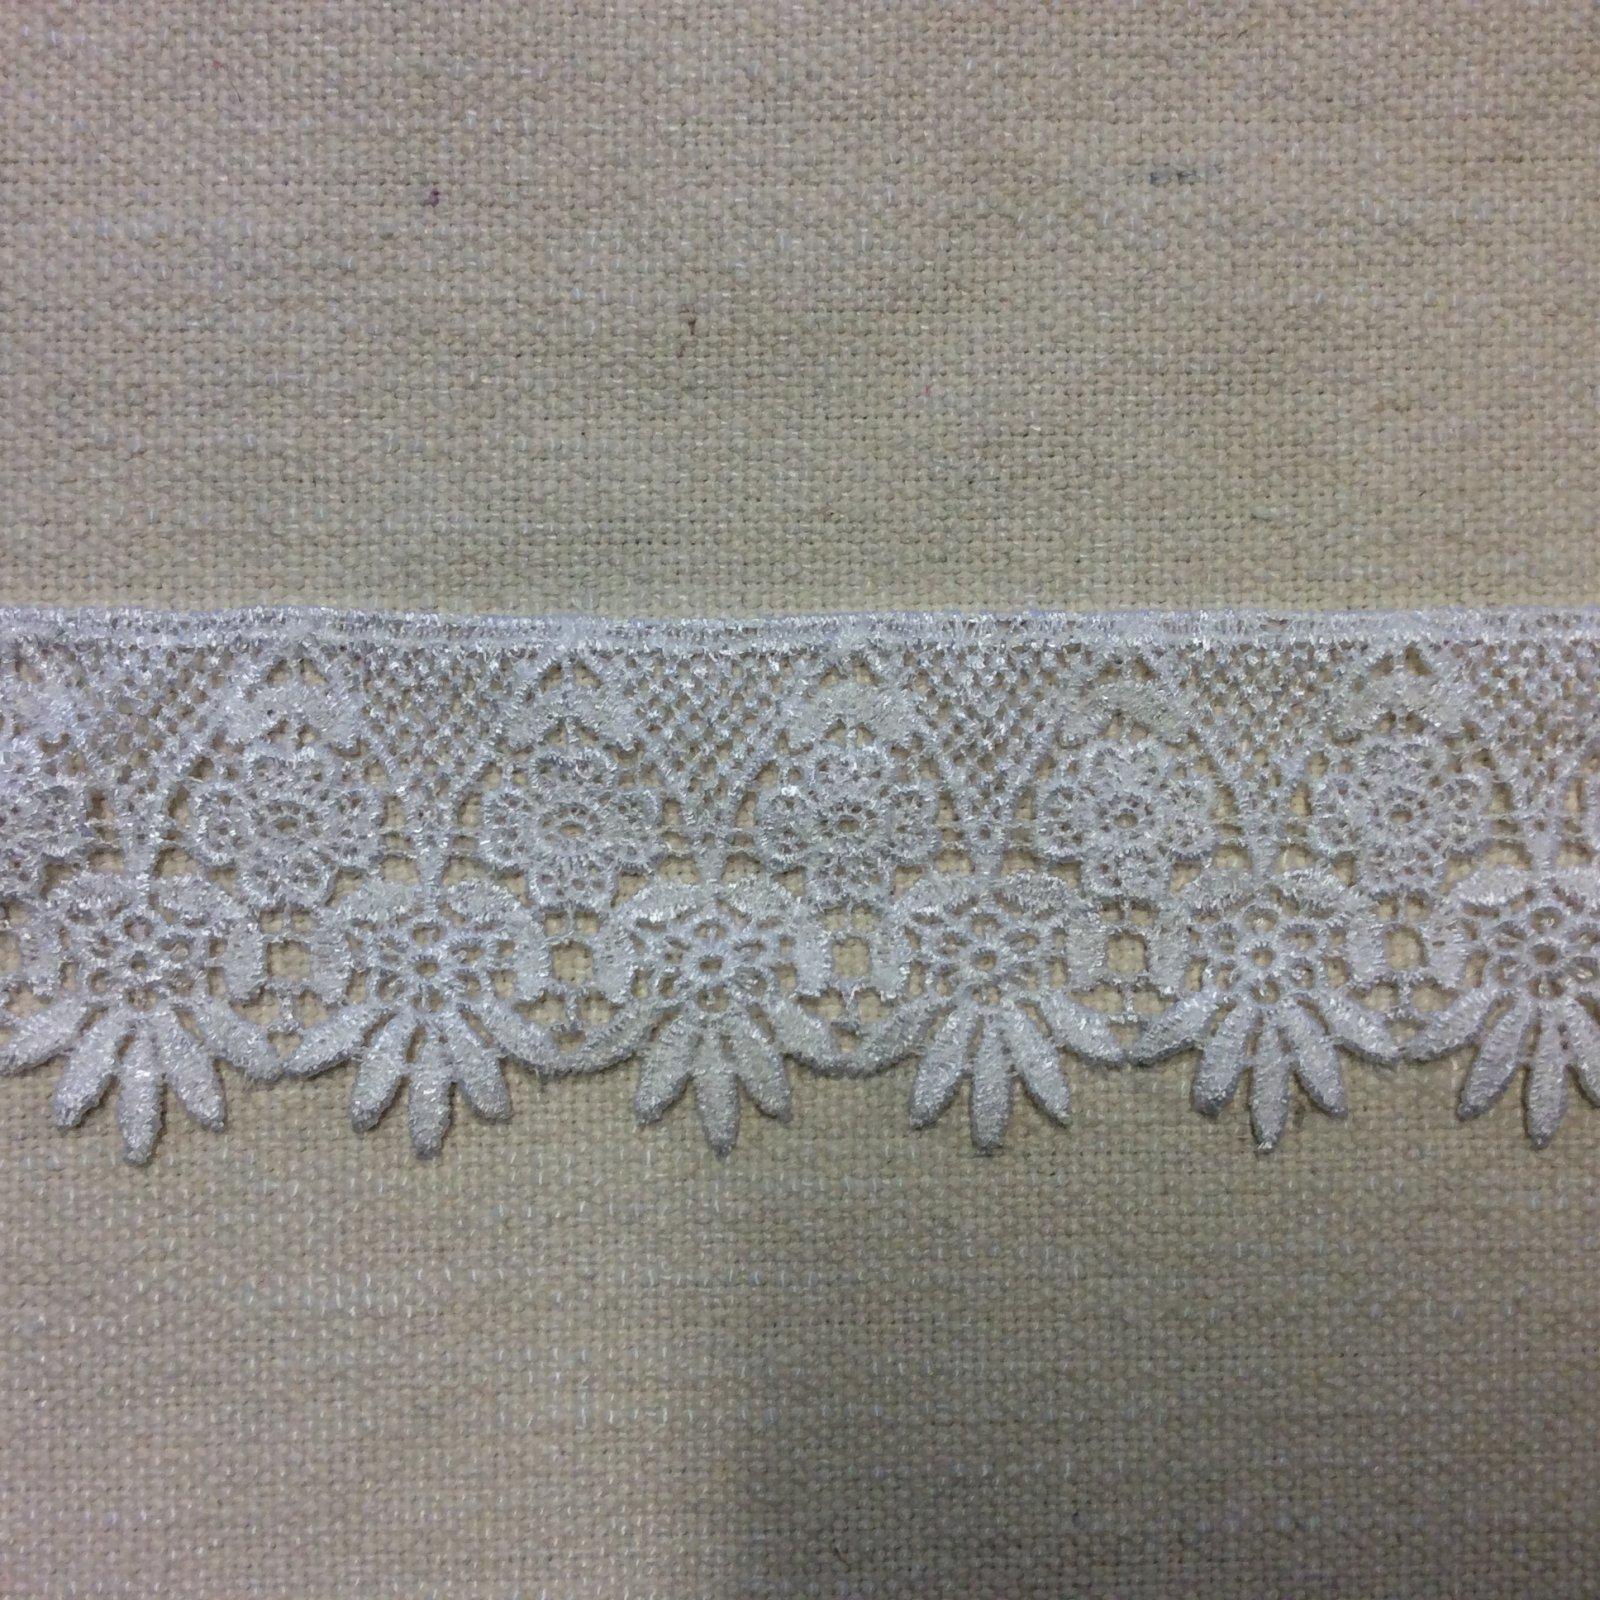 2 White Cotton Blend Bridal Decorative Costume Lace Ribbon Apparel Trim RIB1458